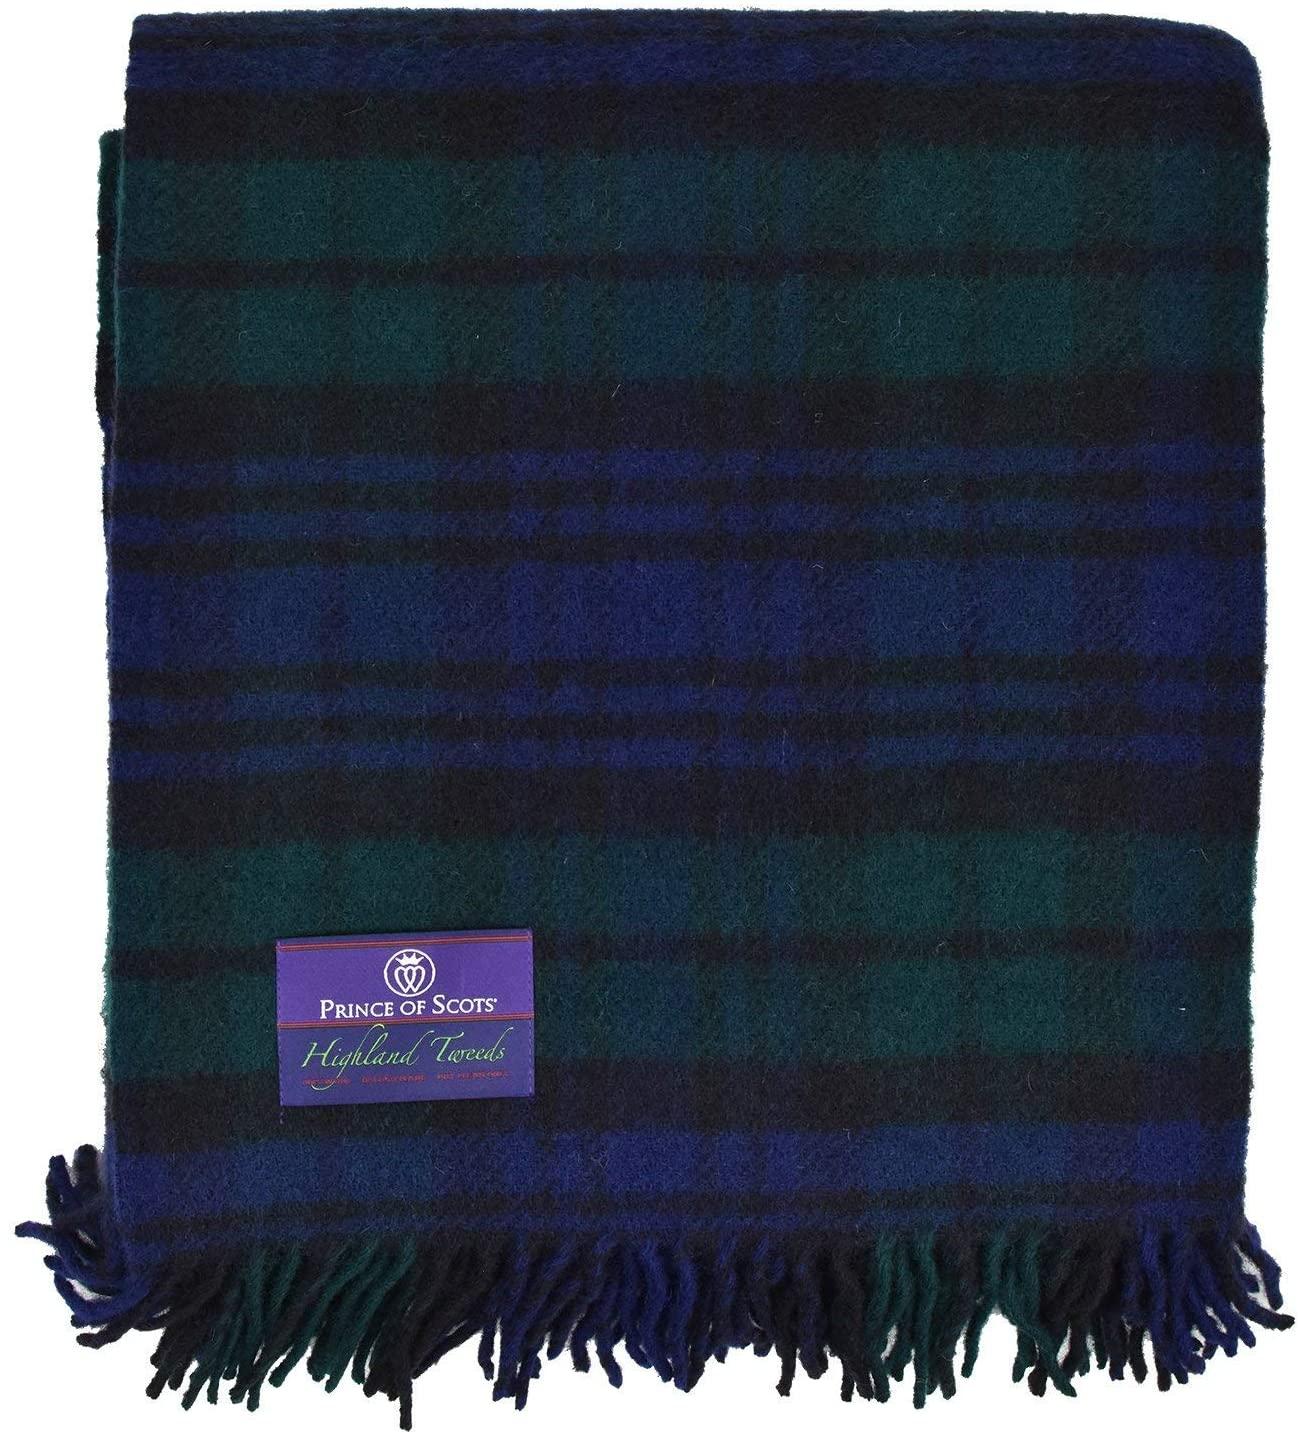 Prince of Scots Highland Tartan Tweed 100% Pure New Wool Fluffy Throw (Black Watch)